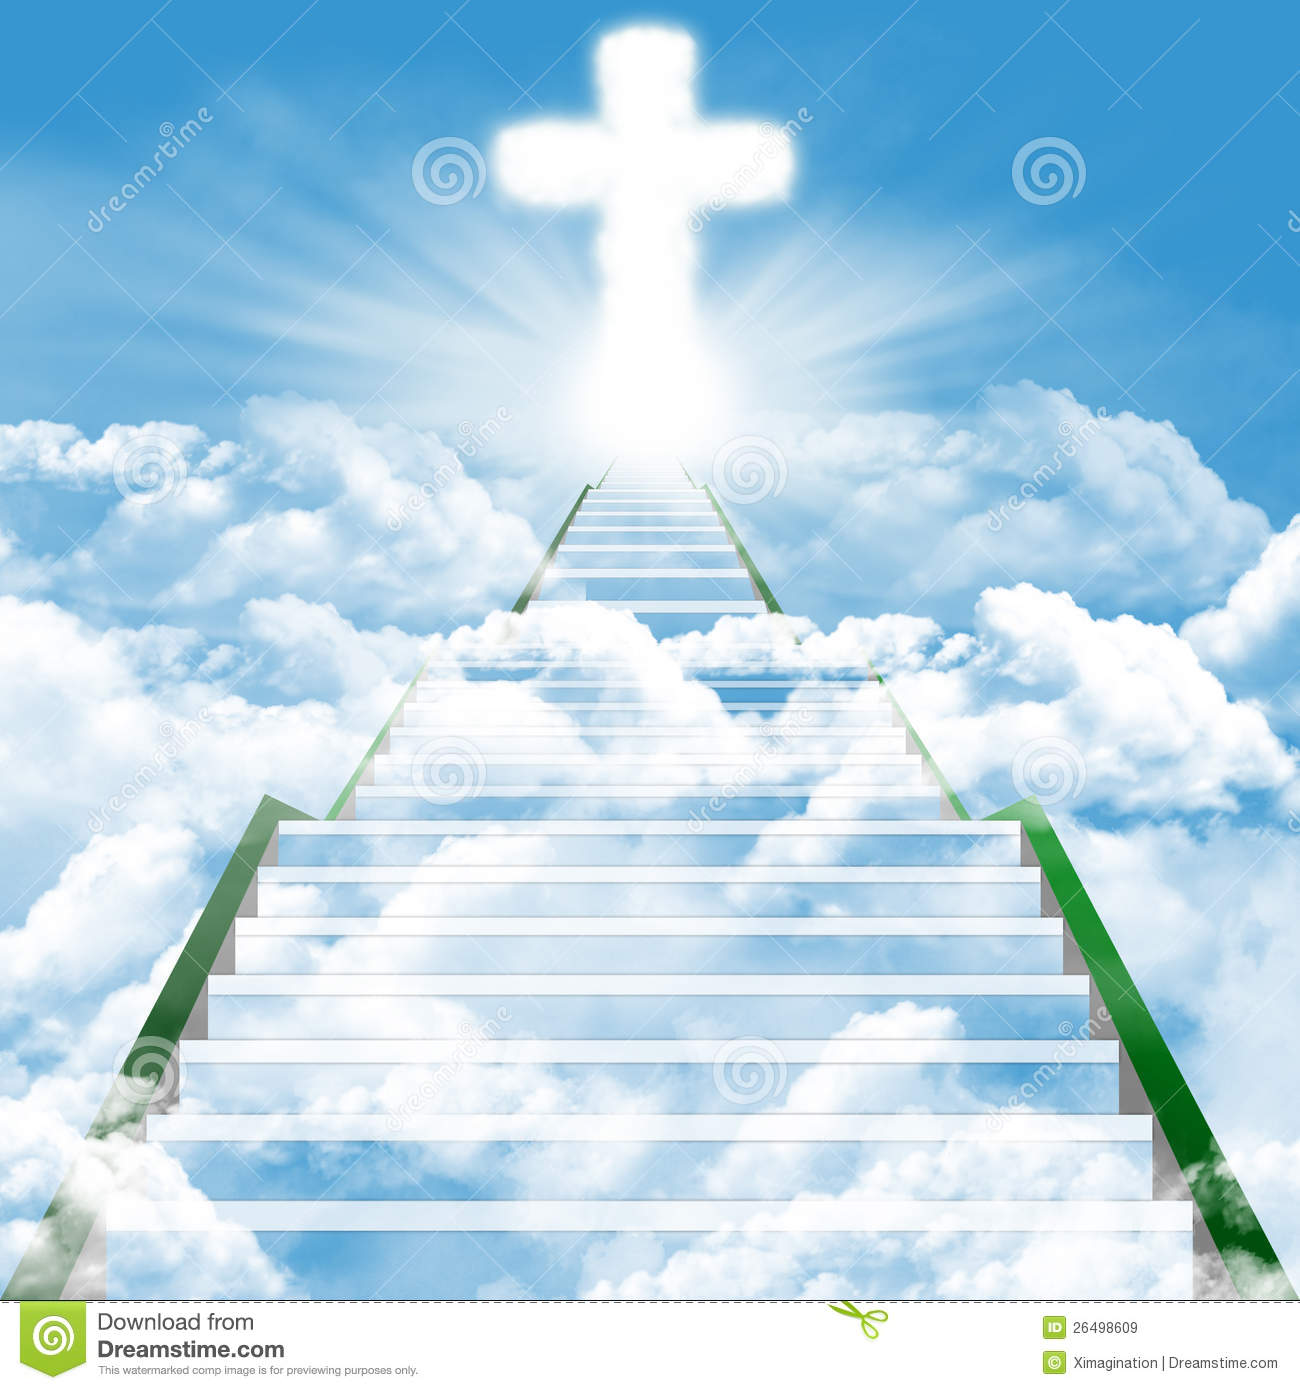 Heaven clipart stairway to heaven Heaven Stairway Clipart (44+) Kid